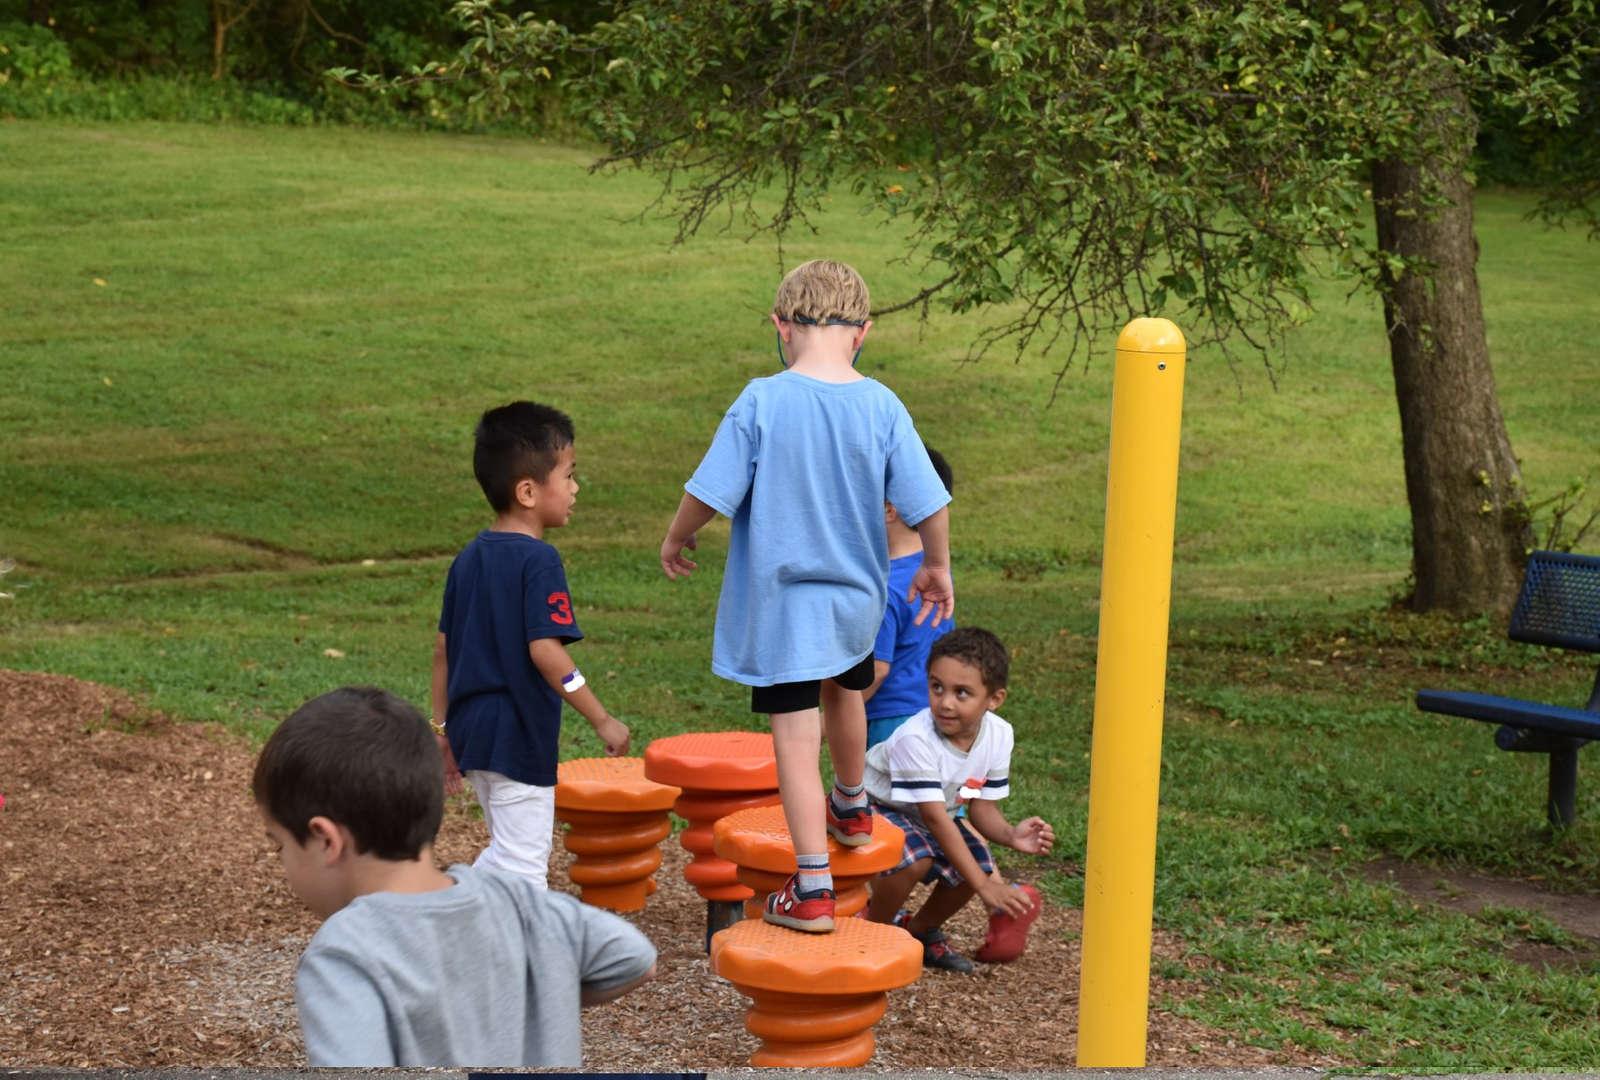 Students on playground